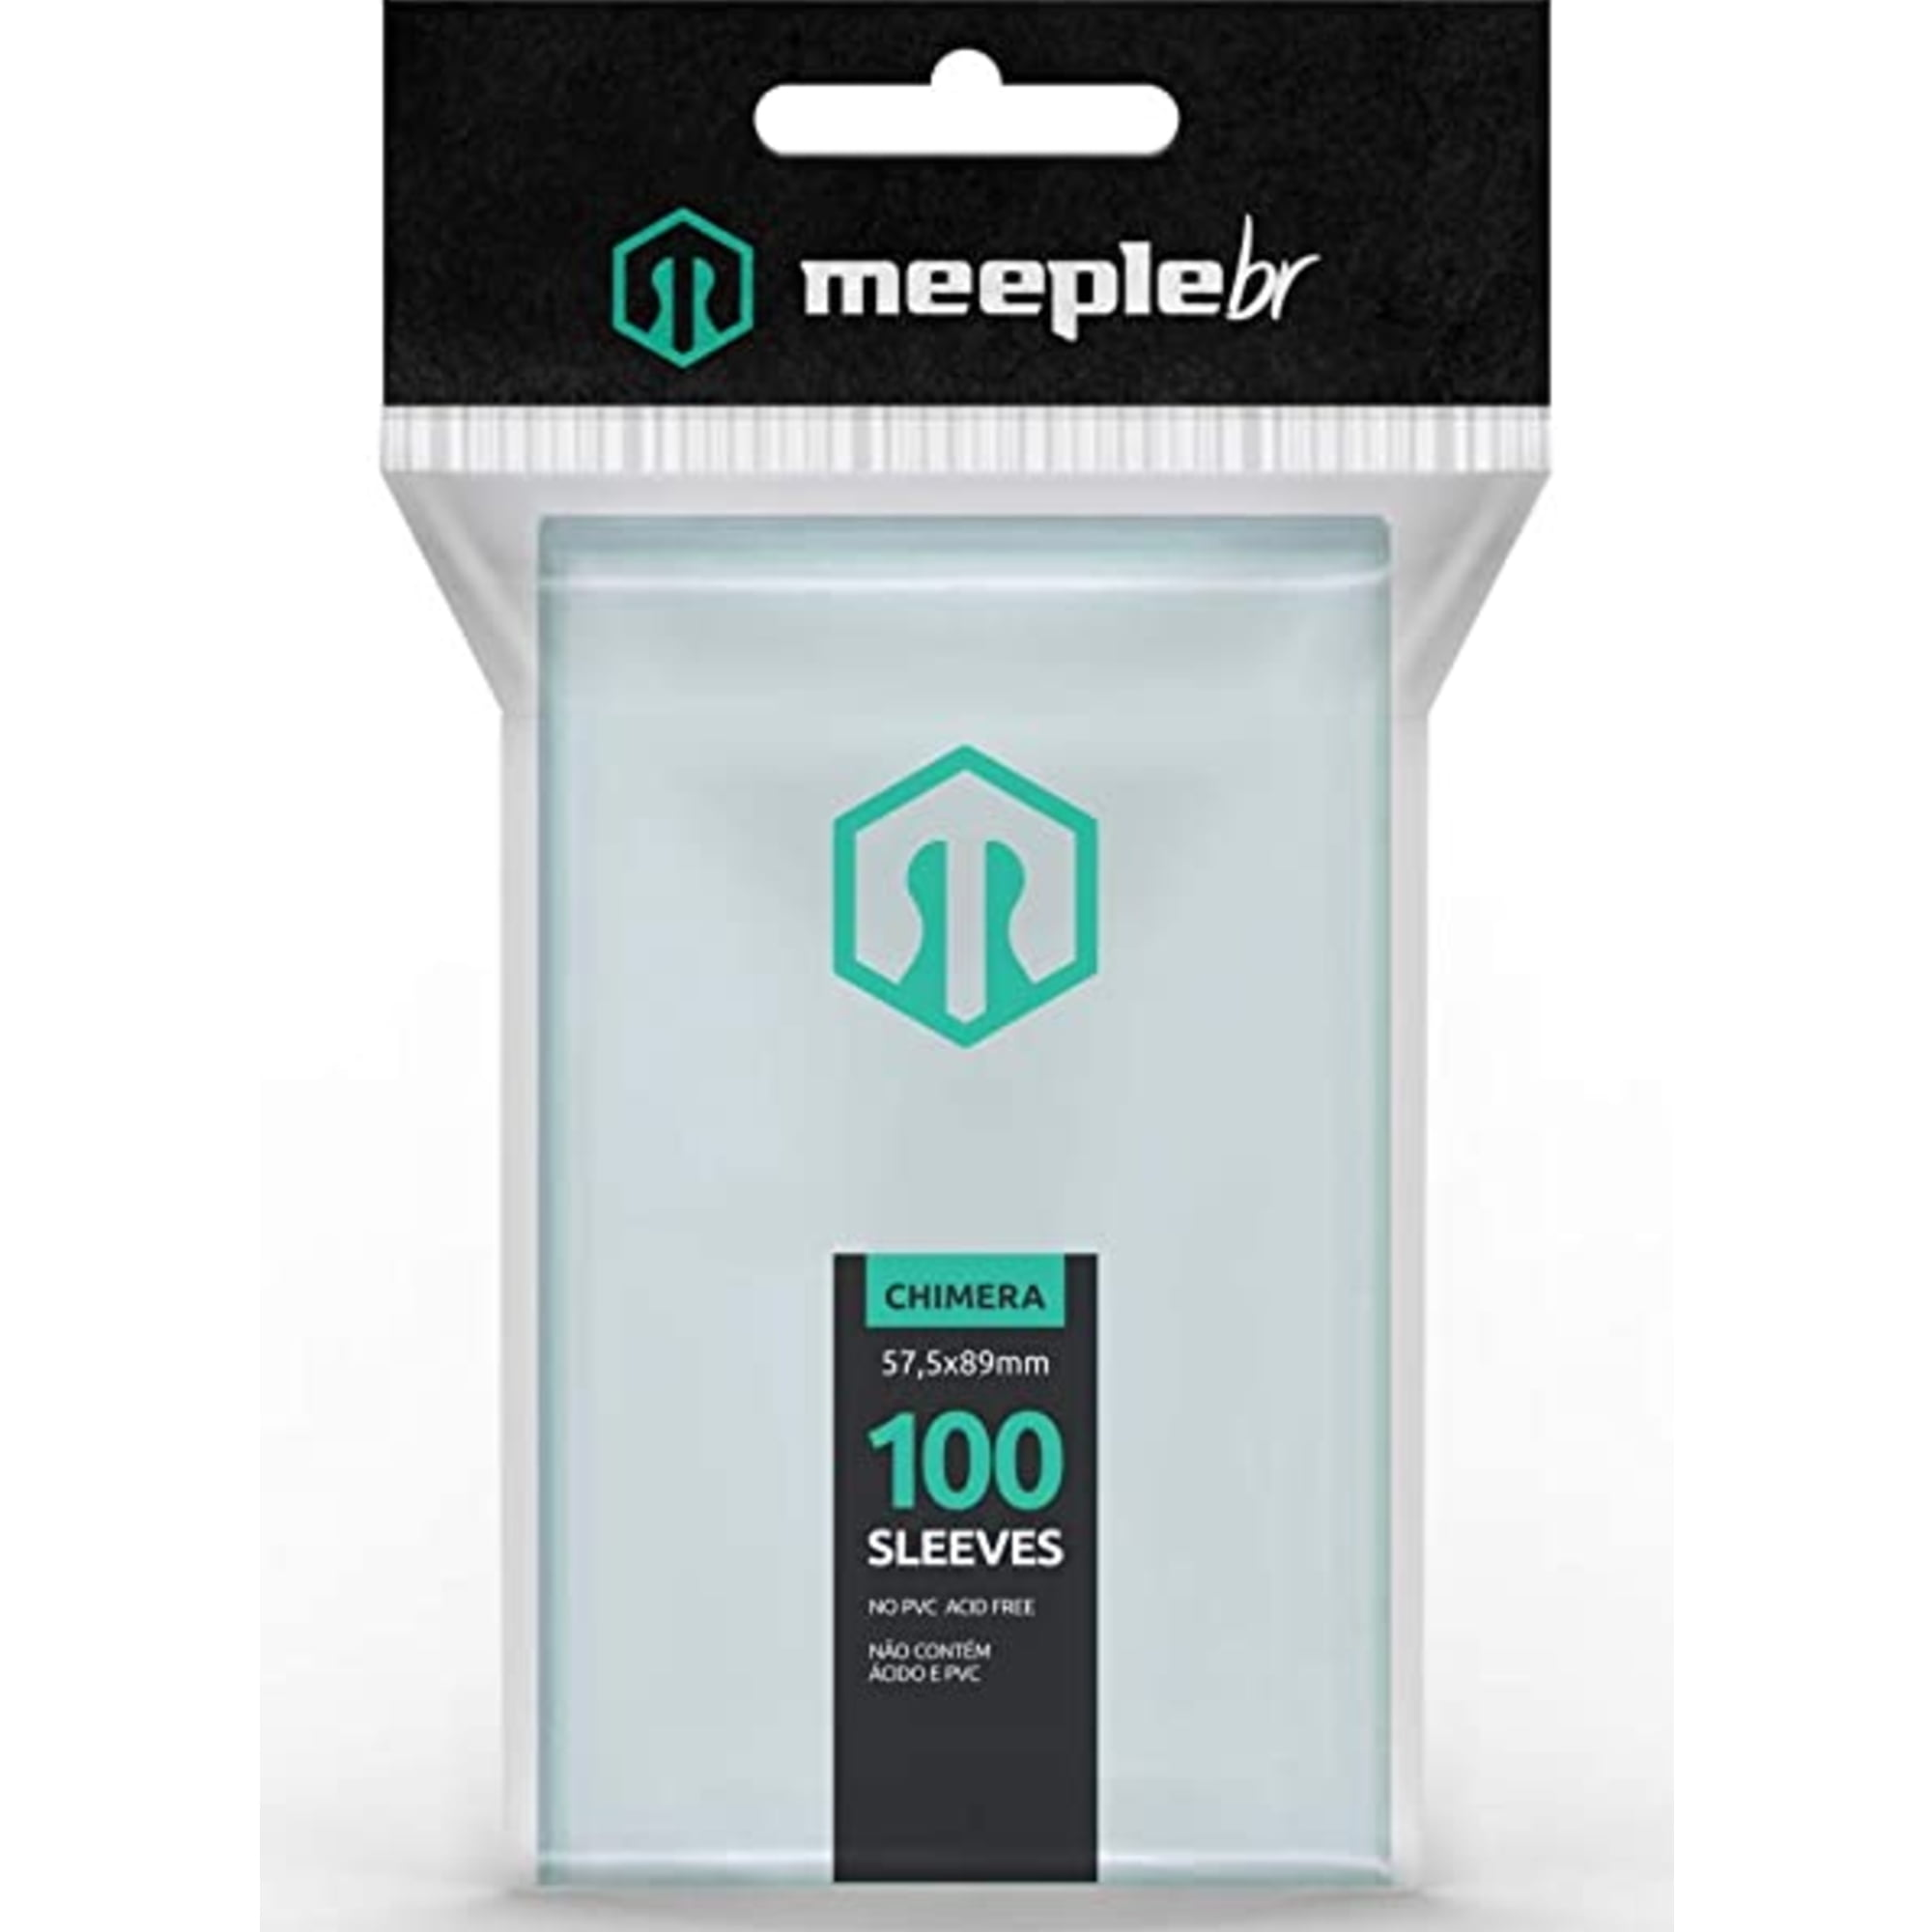 Sleeves Chimera (57,5 x 89mm) MeepleBR